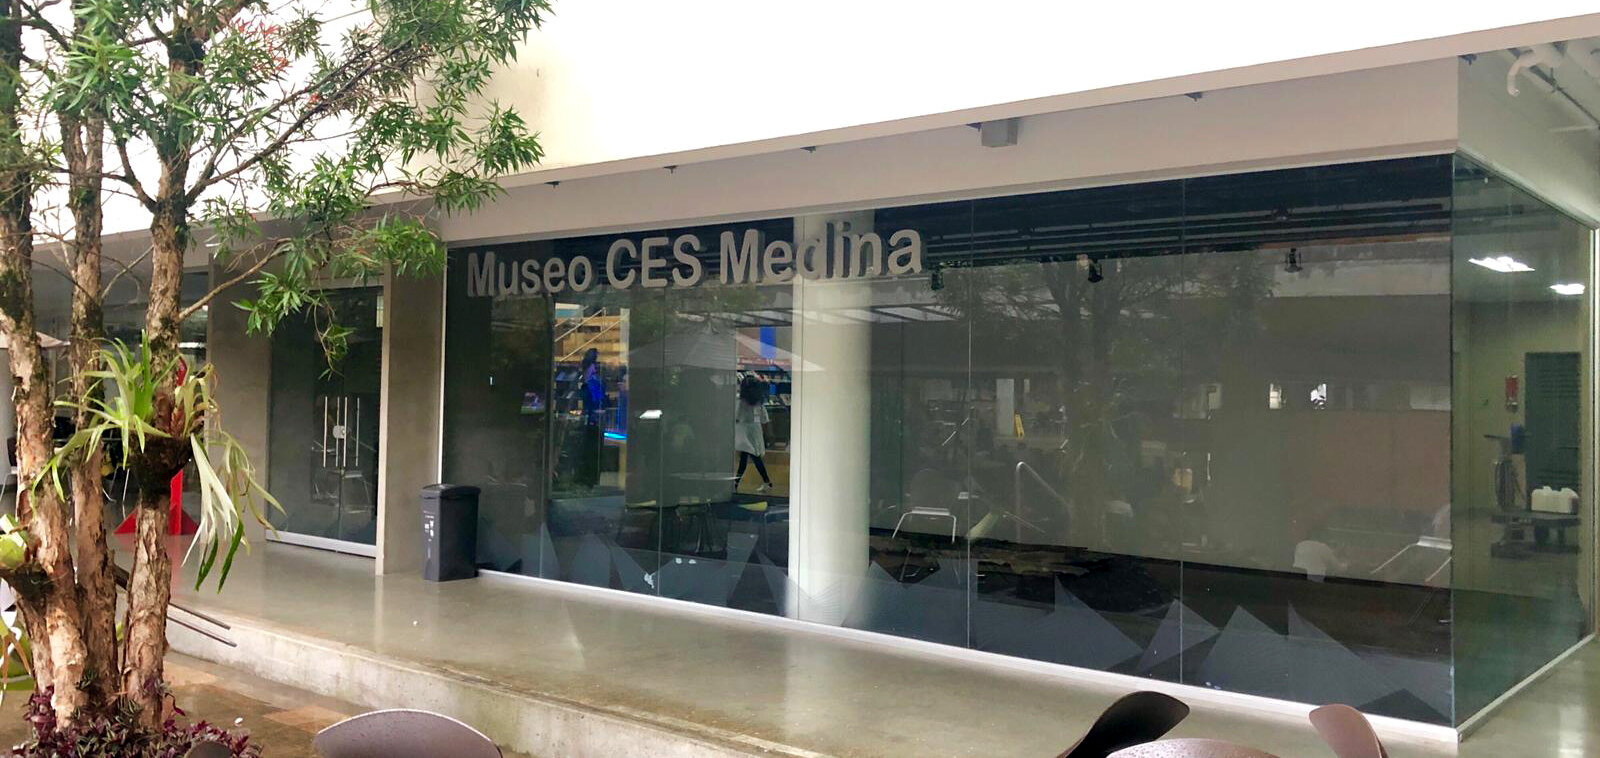 median museum ext 2.jpg